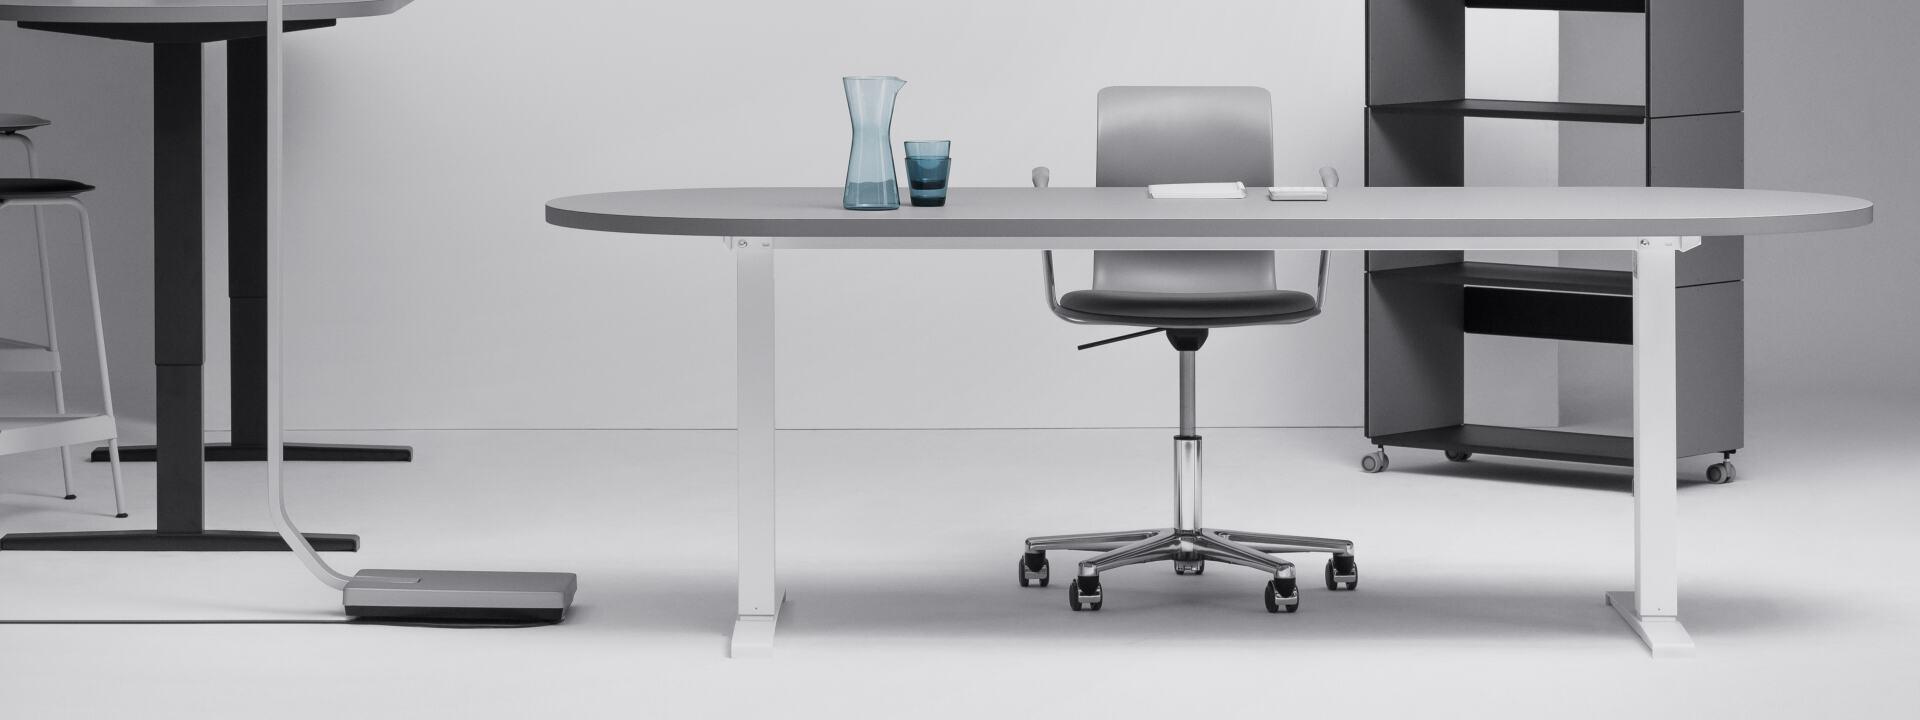 Hubert motorisiert (Bein mittig), Tischgestelle